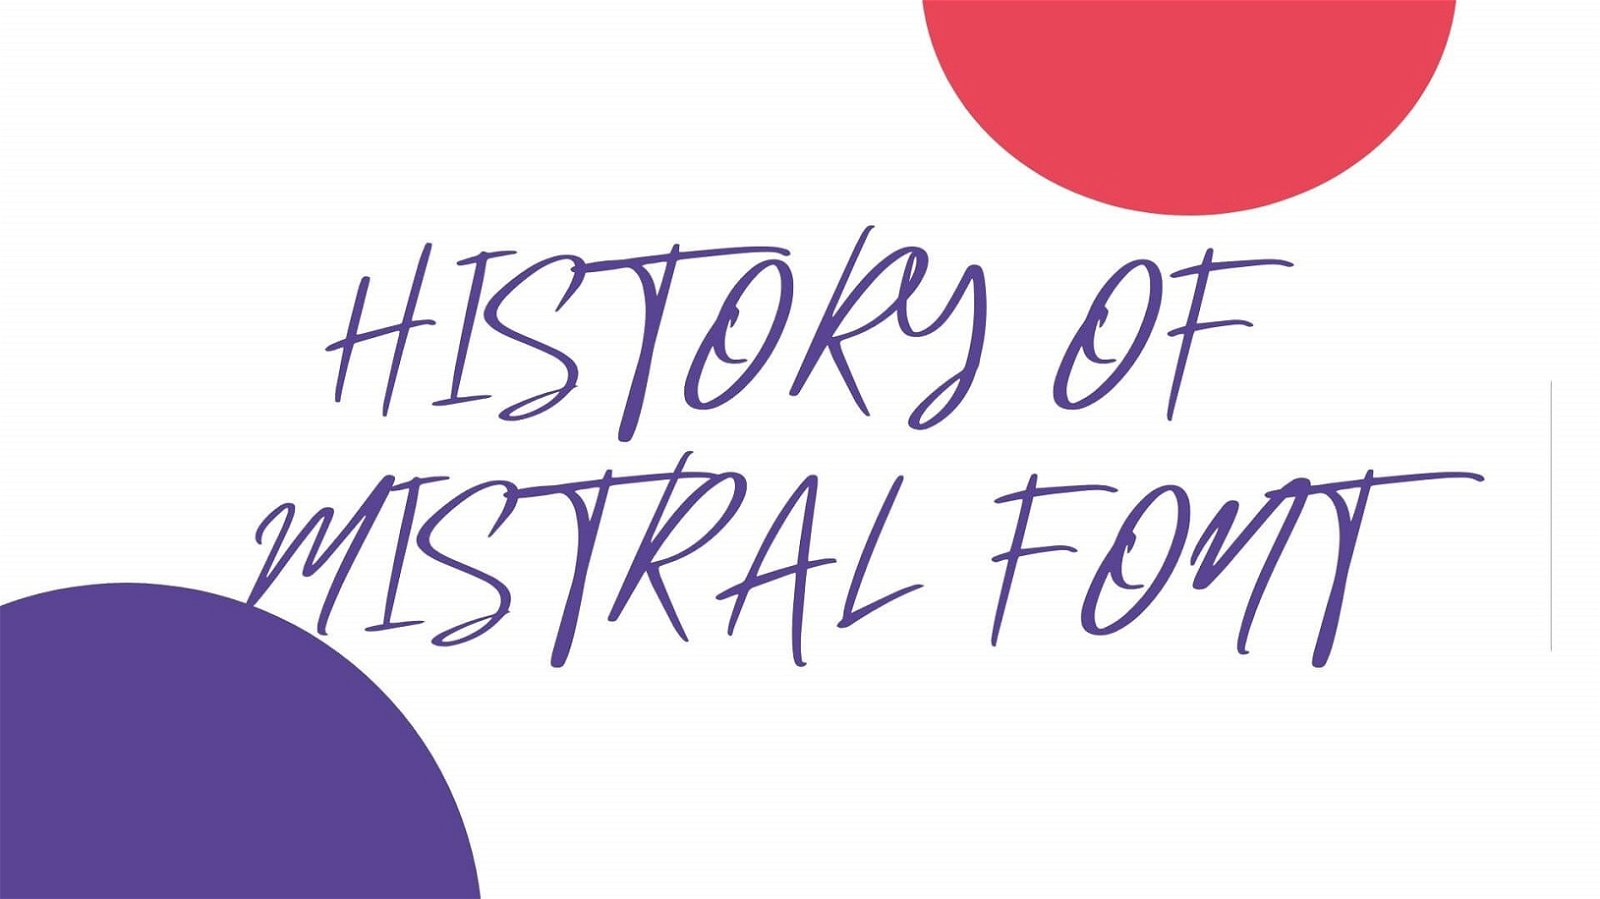 History of Mistral Font